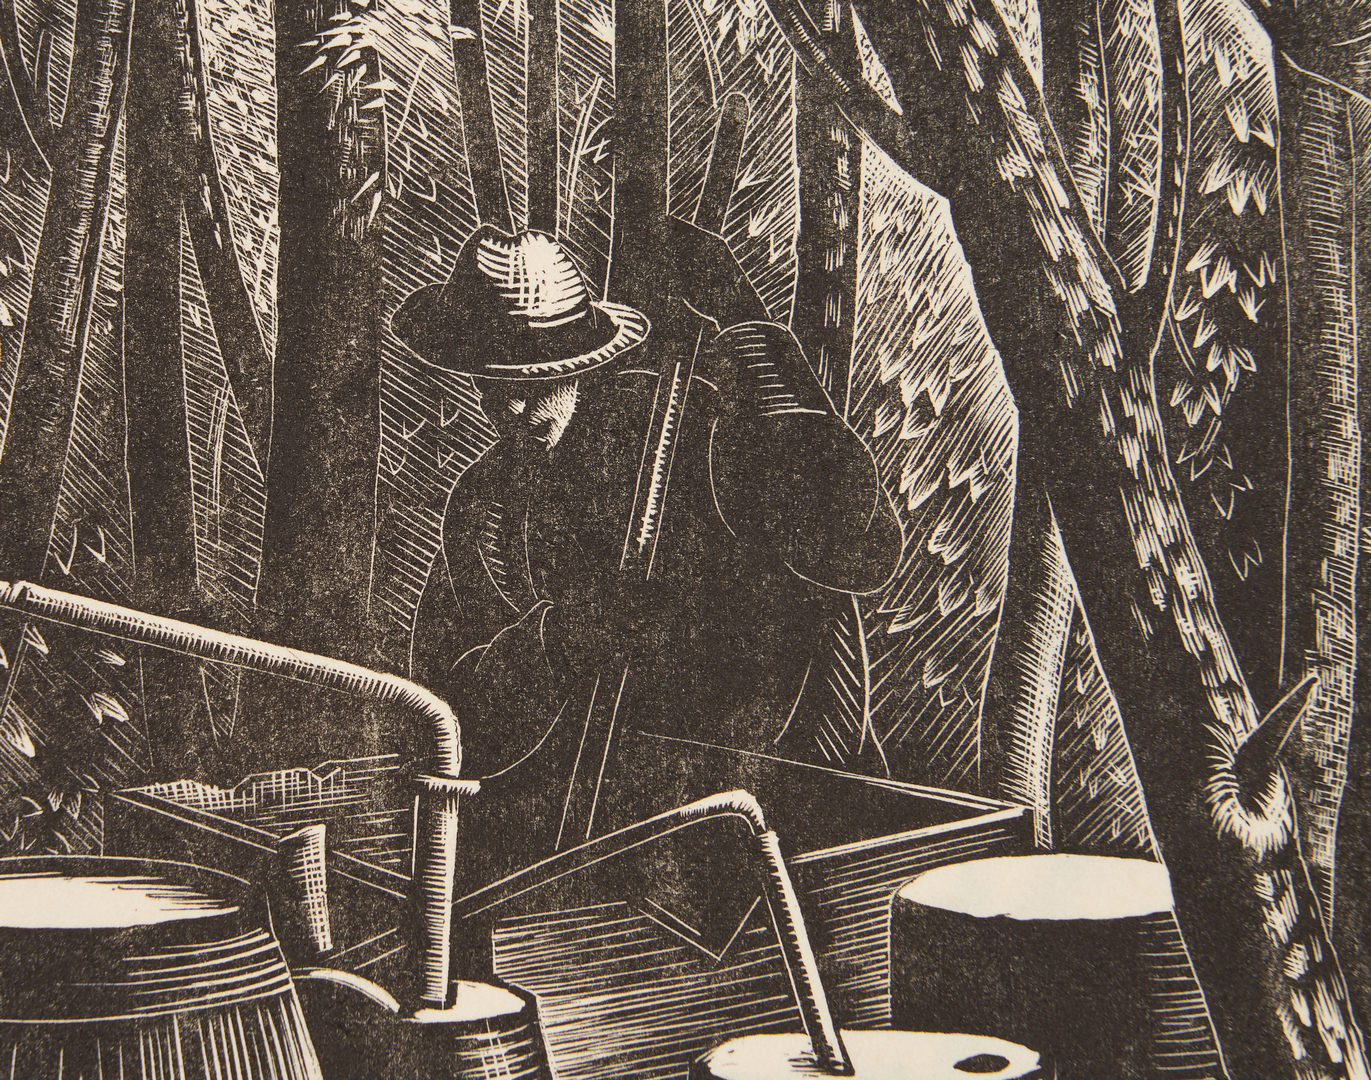 Lot 813: Clare Leighton Wood Engraving, Moonshine Still, North Carolina